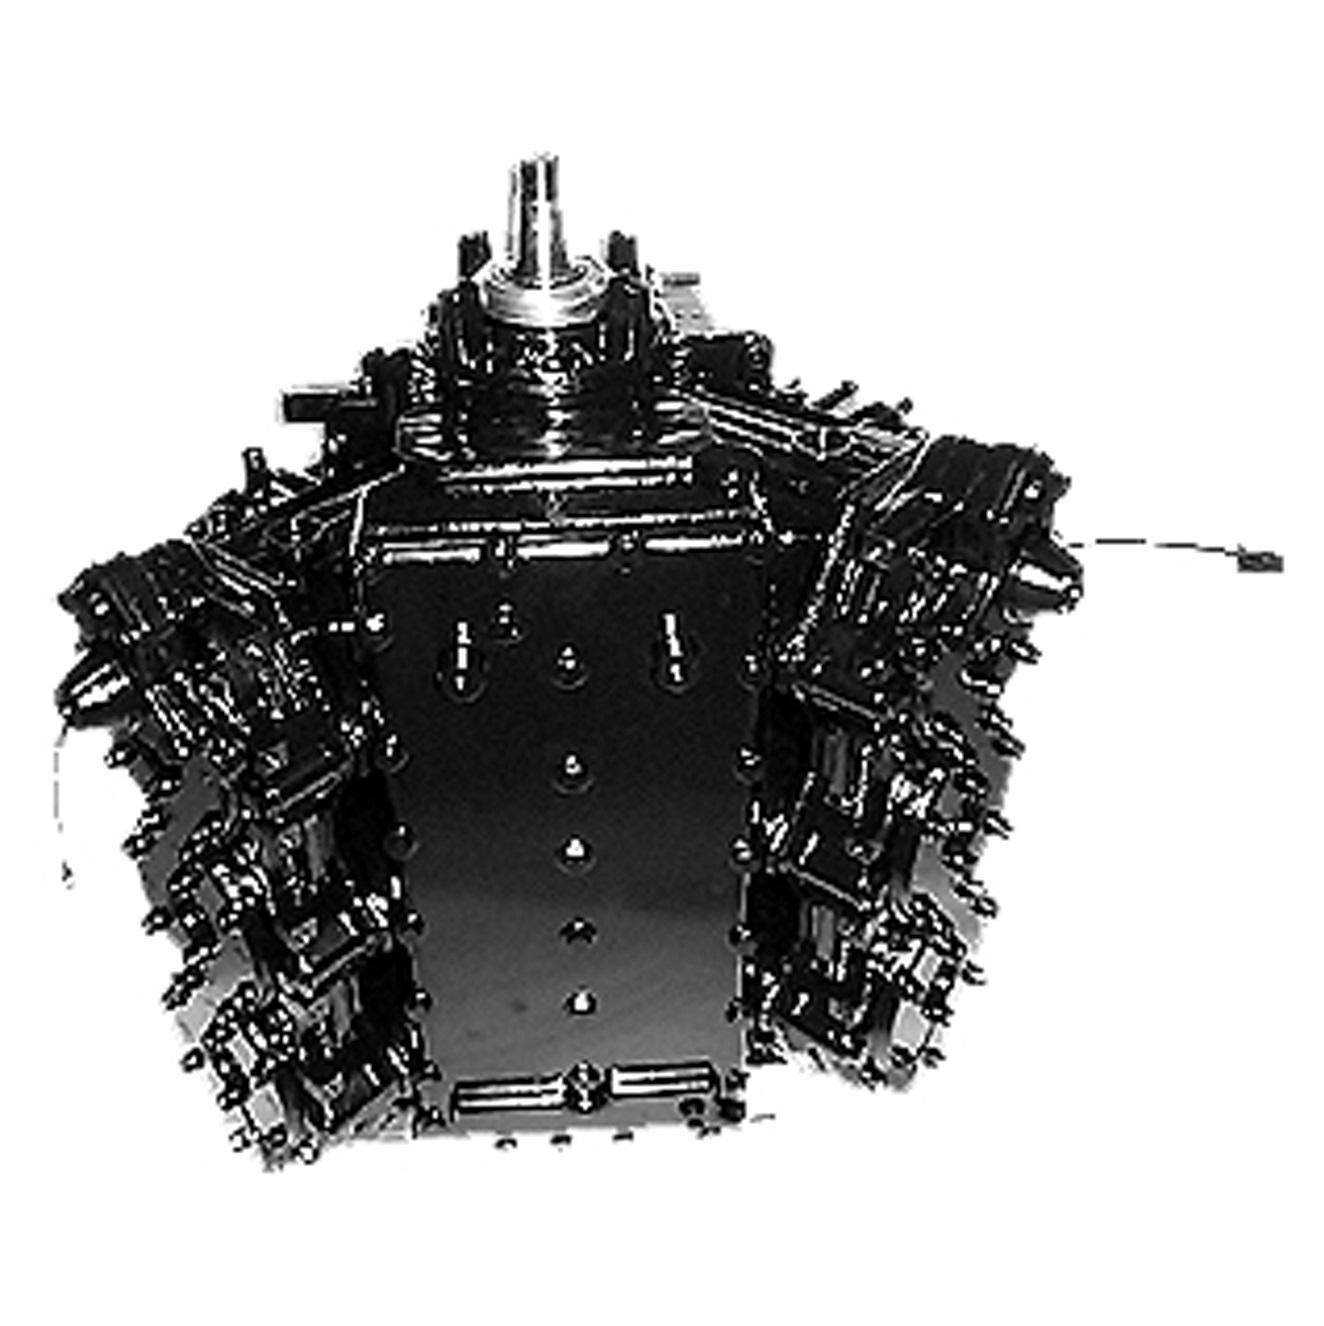 je-v6-crossflow-flatback-complete-powerhead.jpg